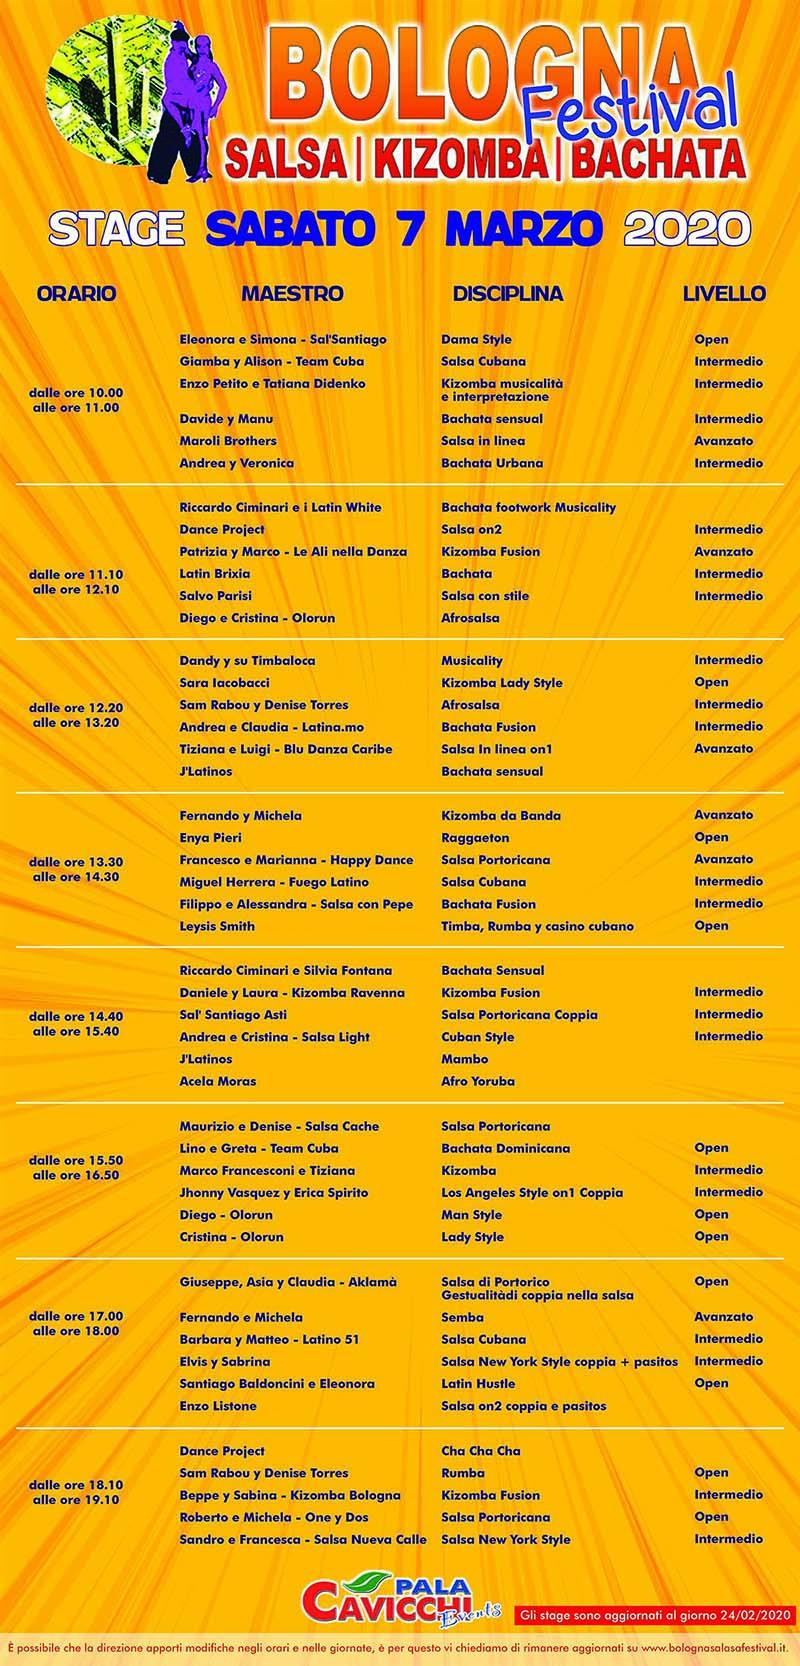 BSF - Stage Sabato 7 Marzo 2020